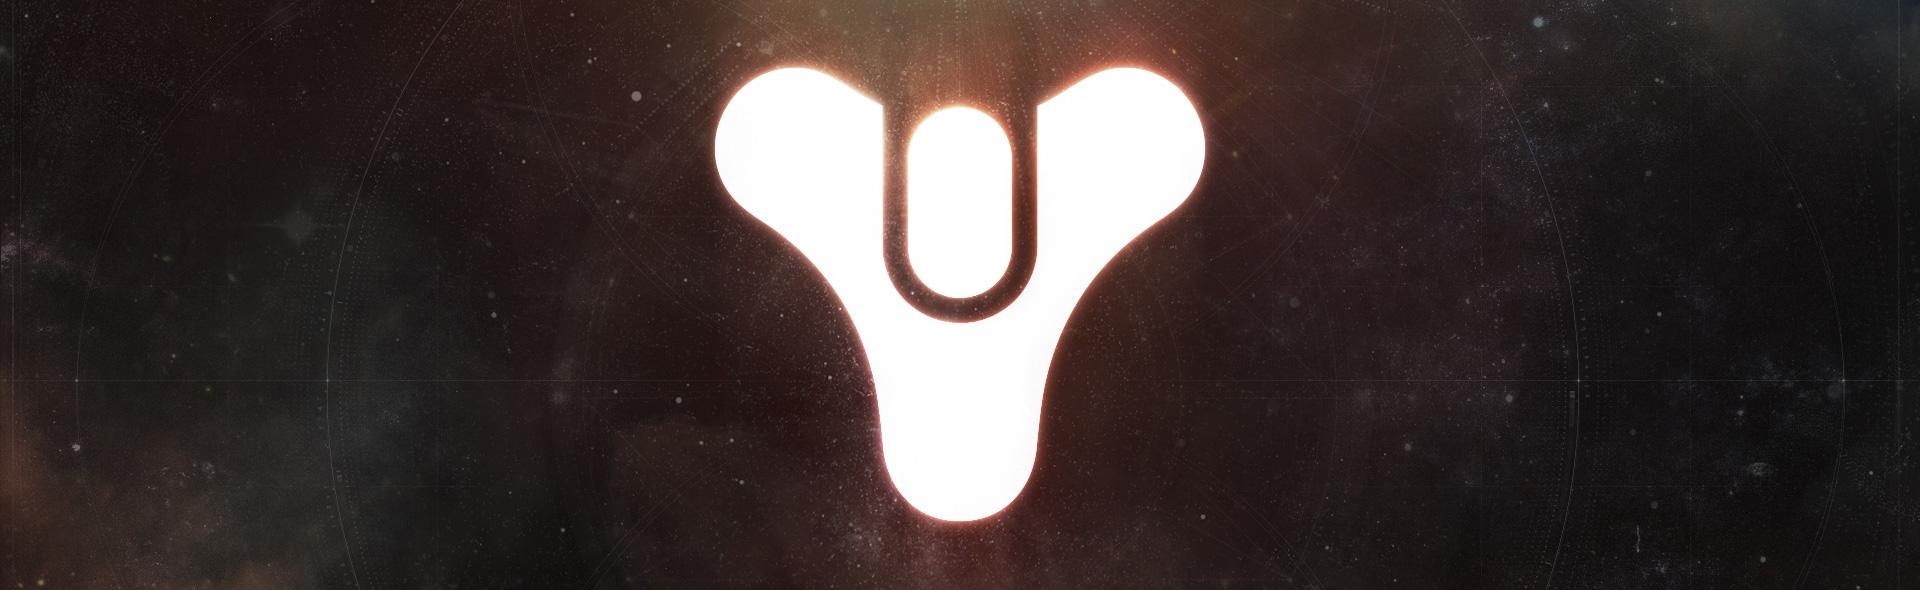 Destiny Matchmaking Raids hjemmeside